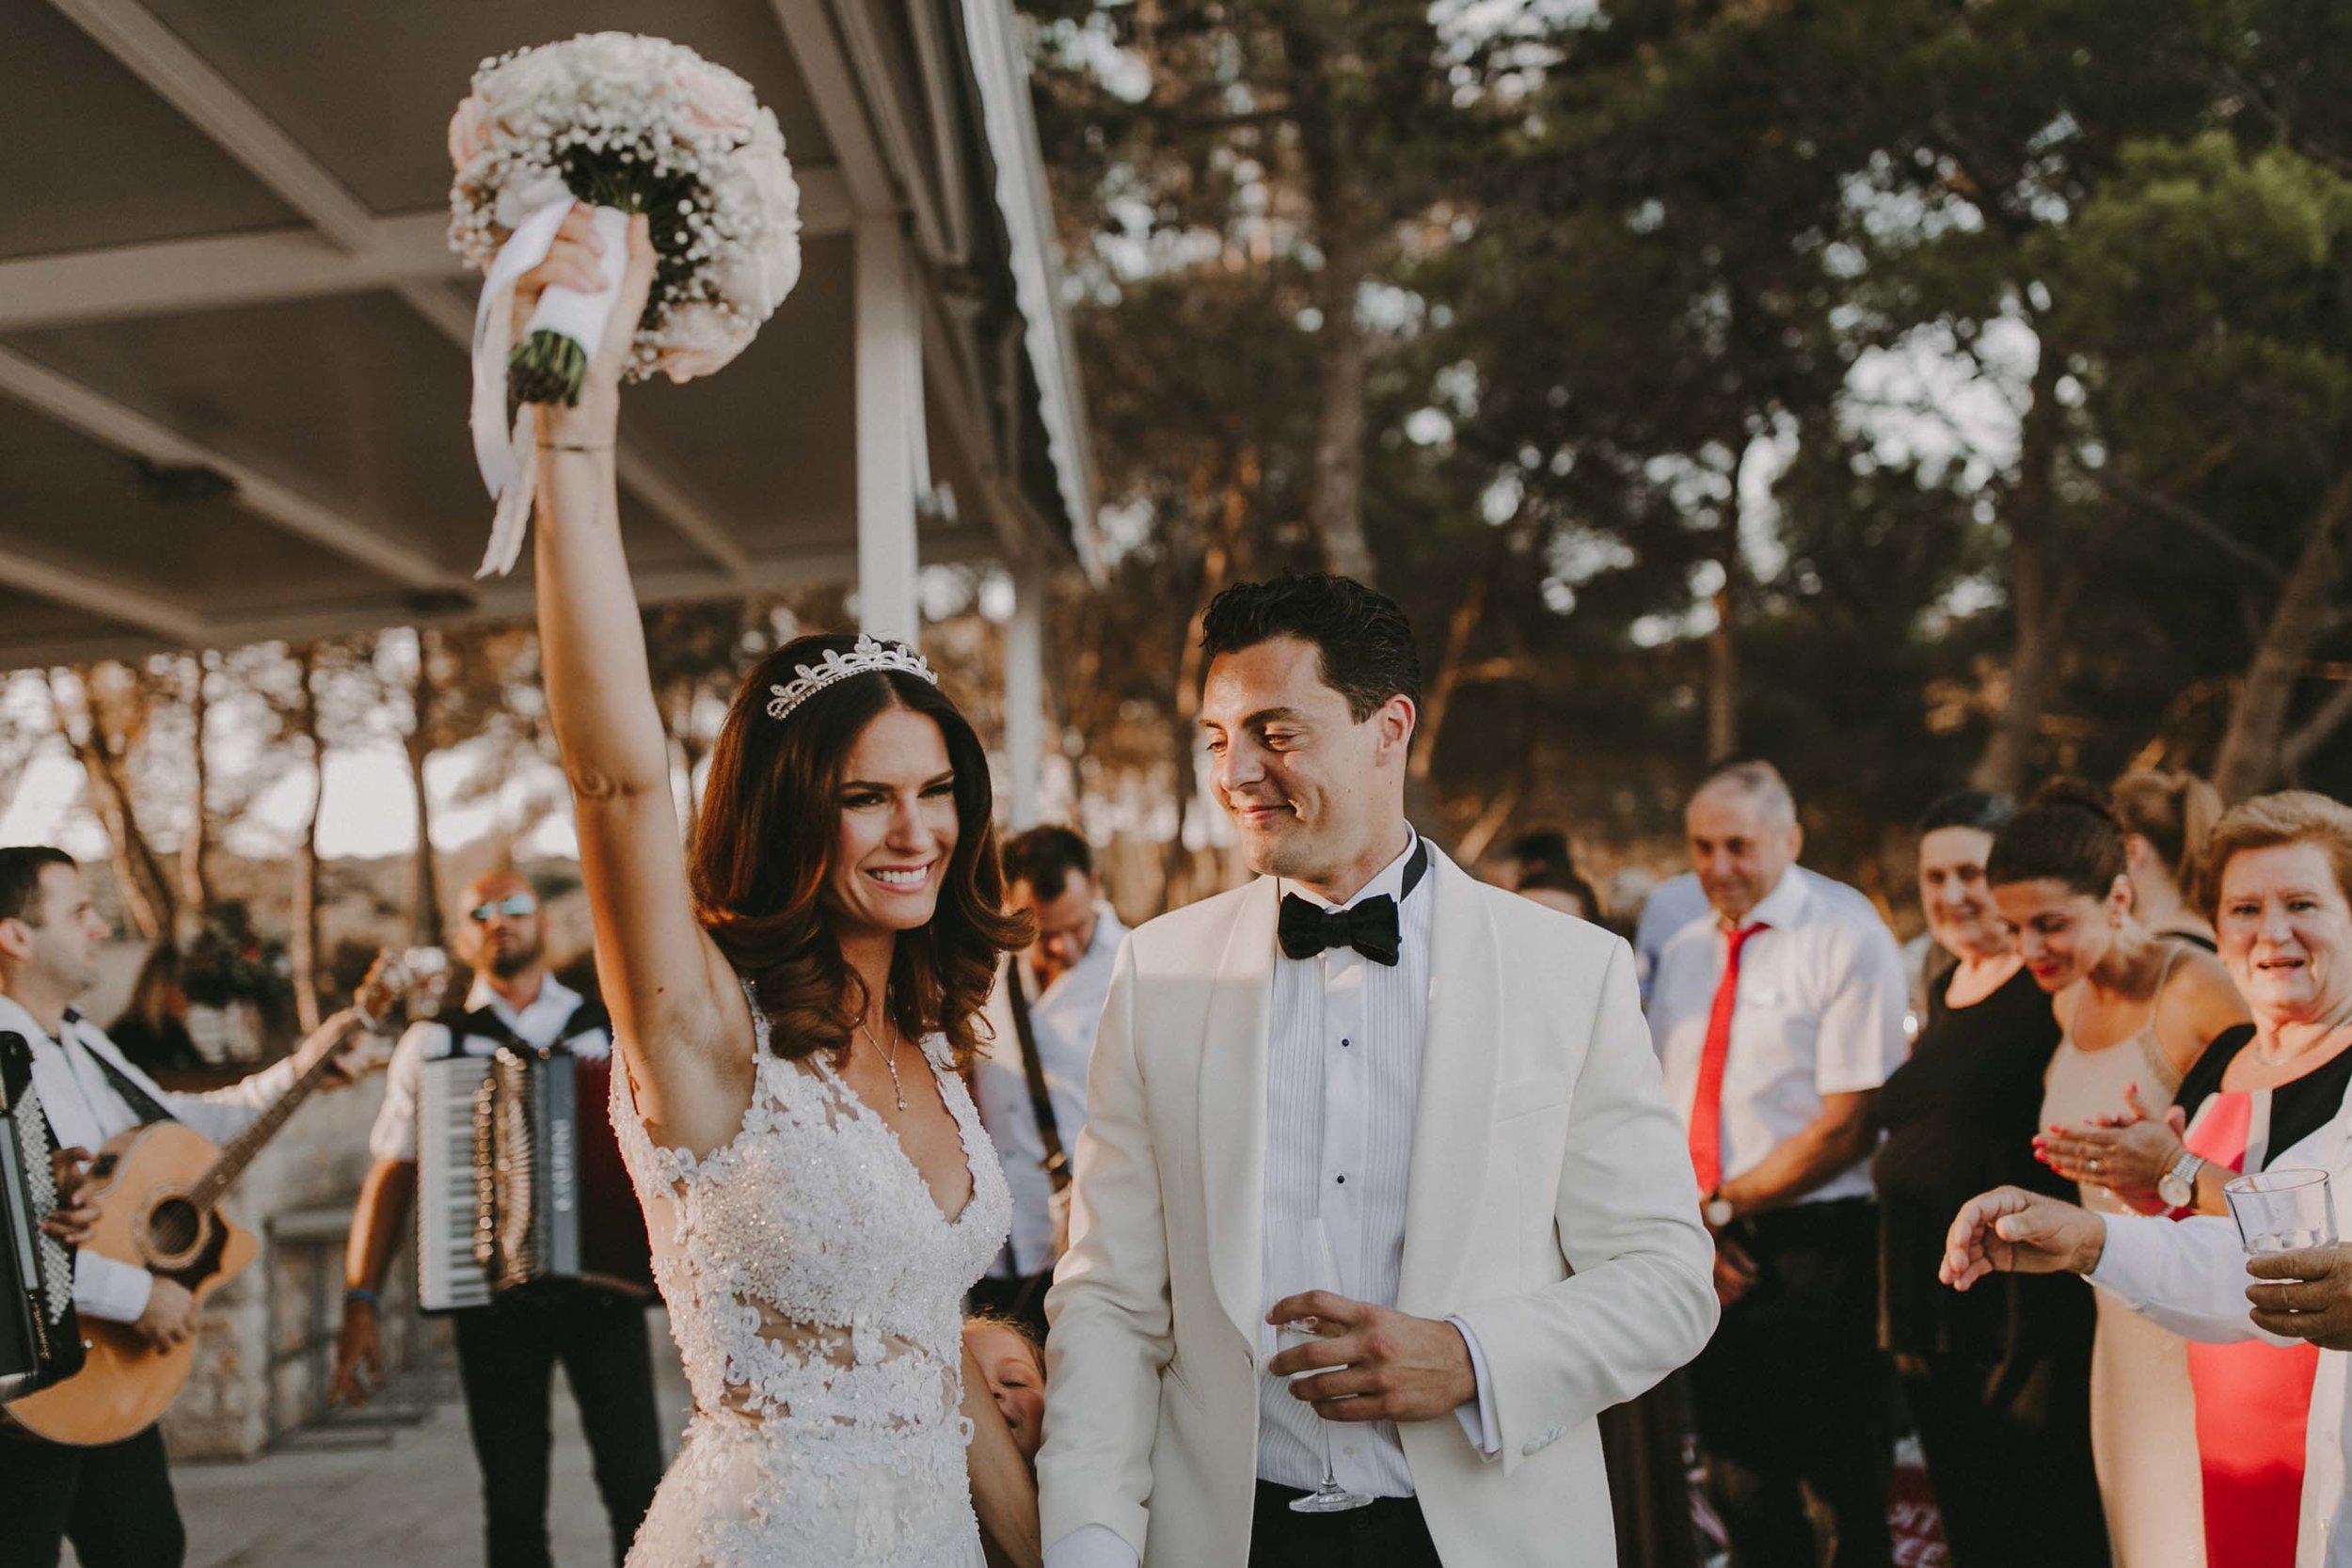 sylvia&dimitri-Wedding-Crvena_Luka-Croatia-54(7948).jpg